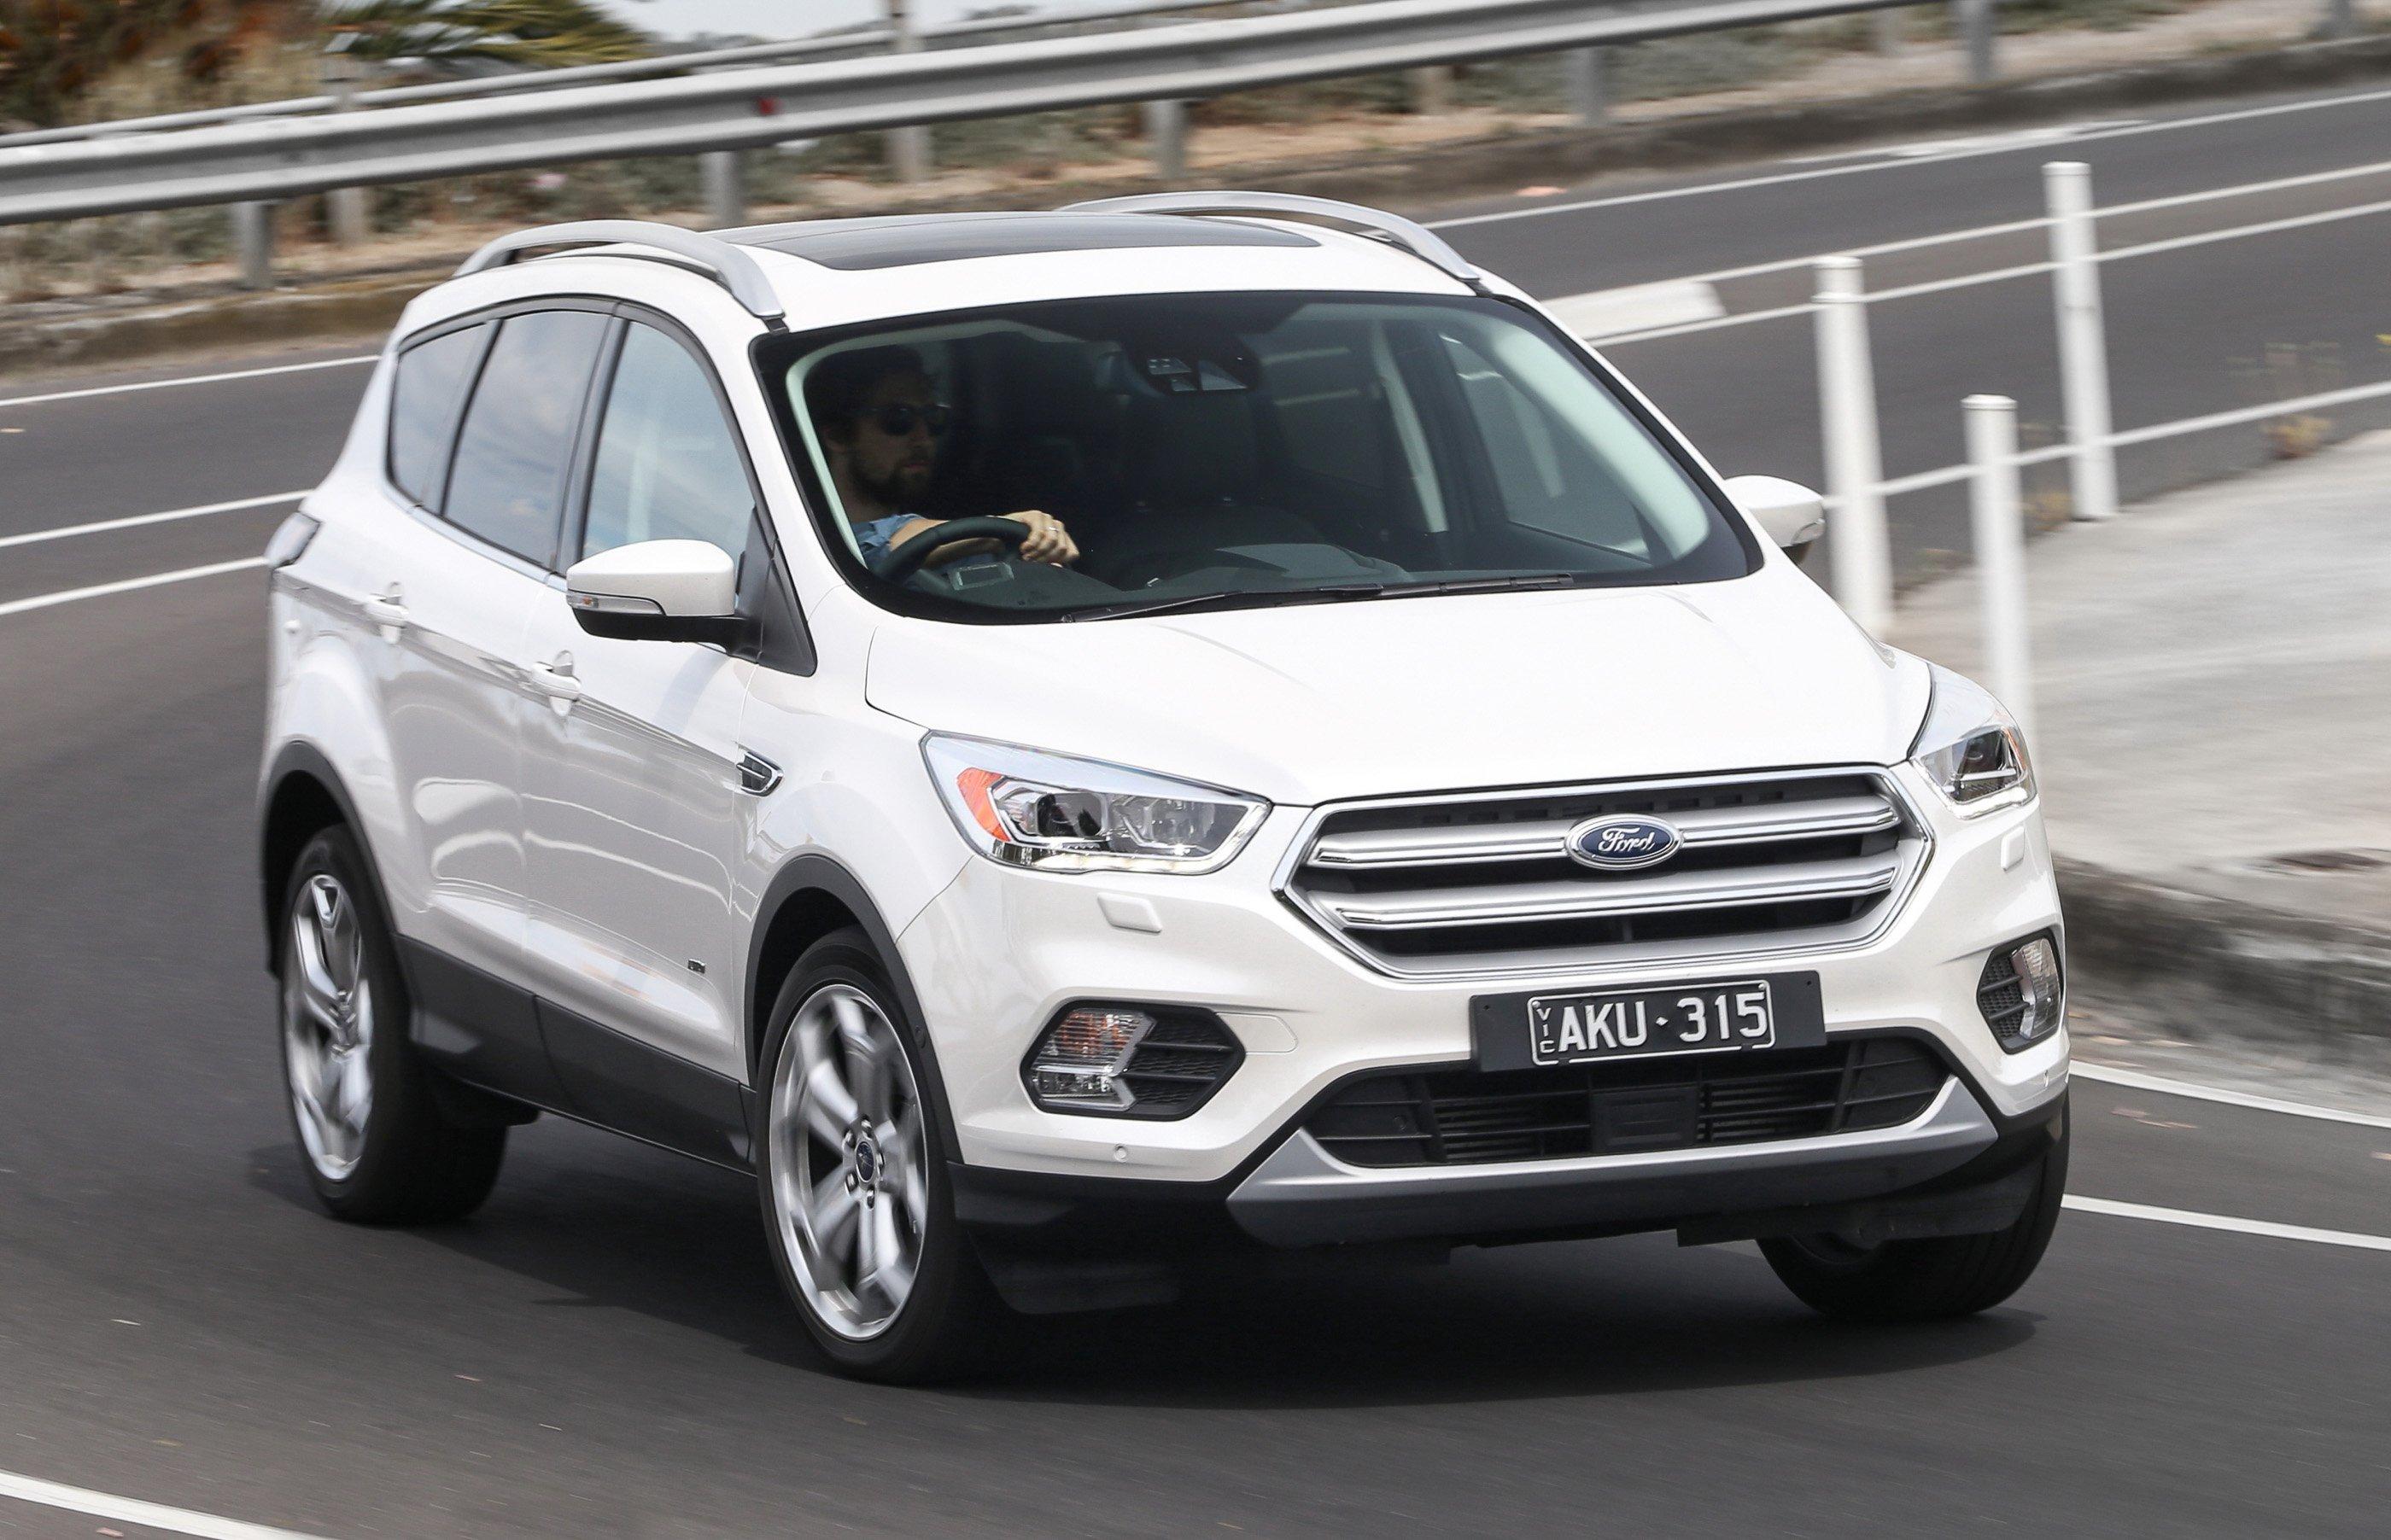 2017 Ford Escape Review: Quick Drive